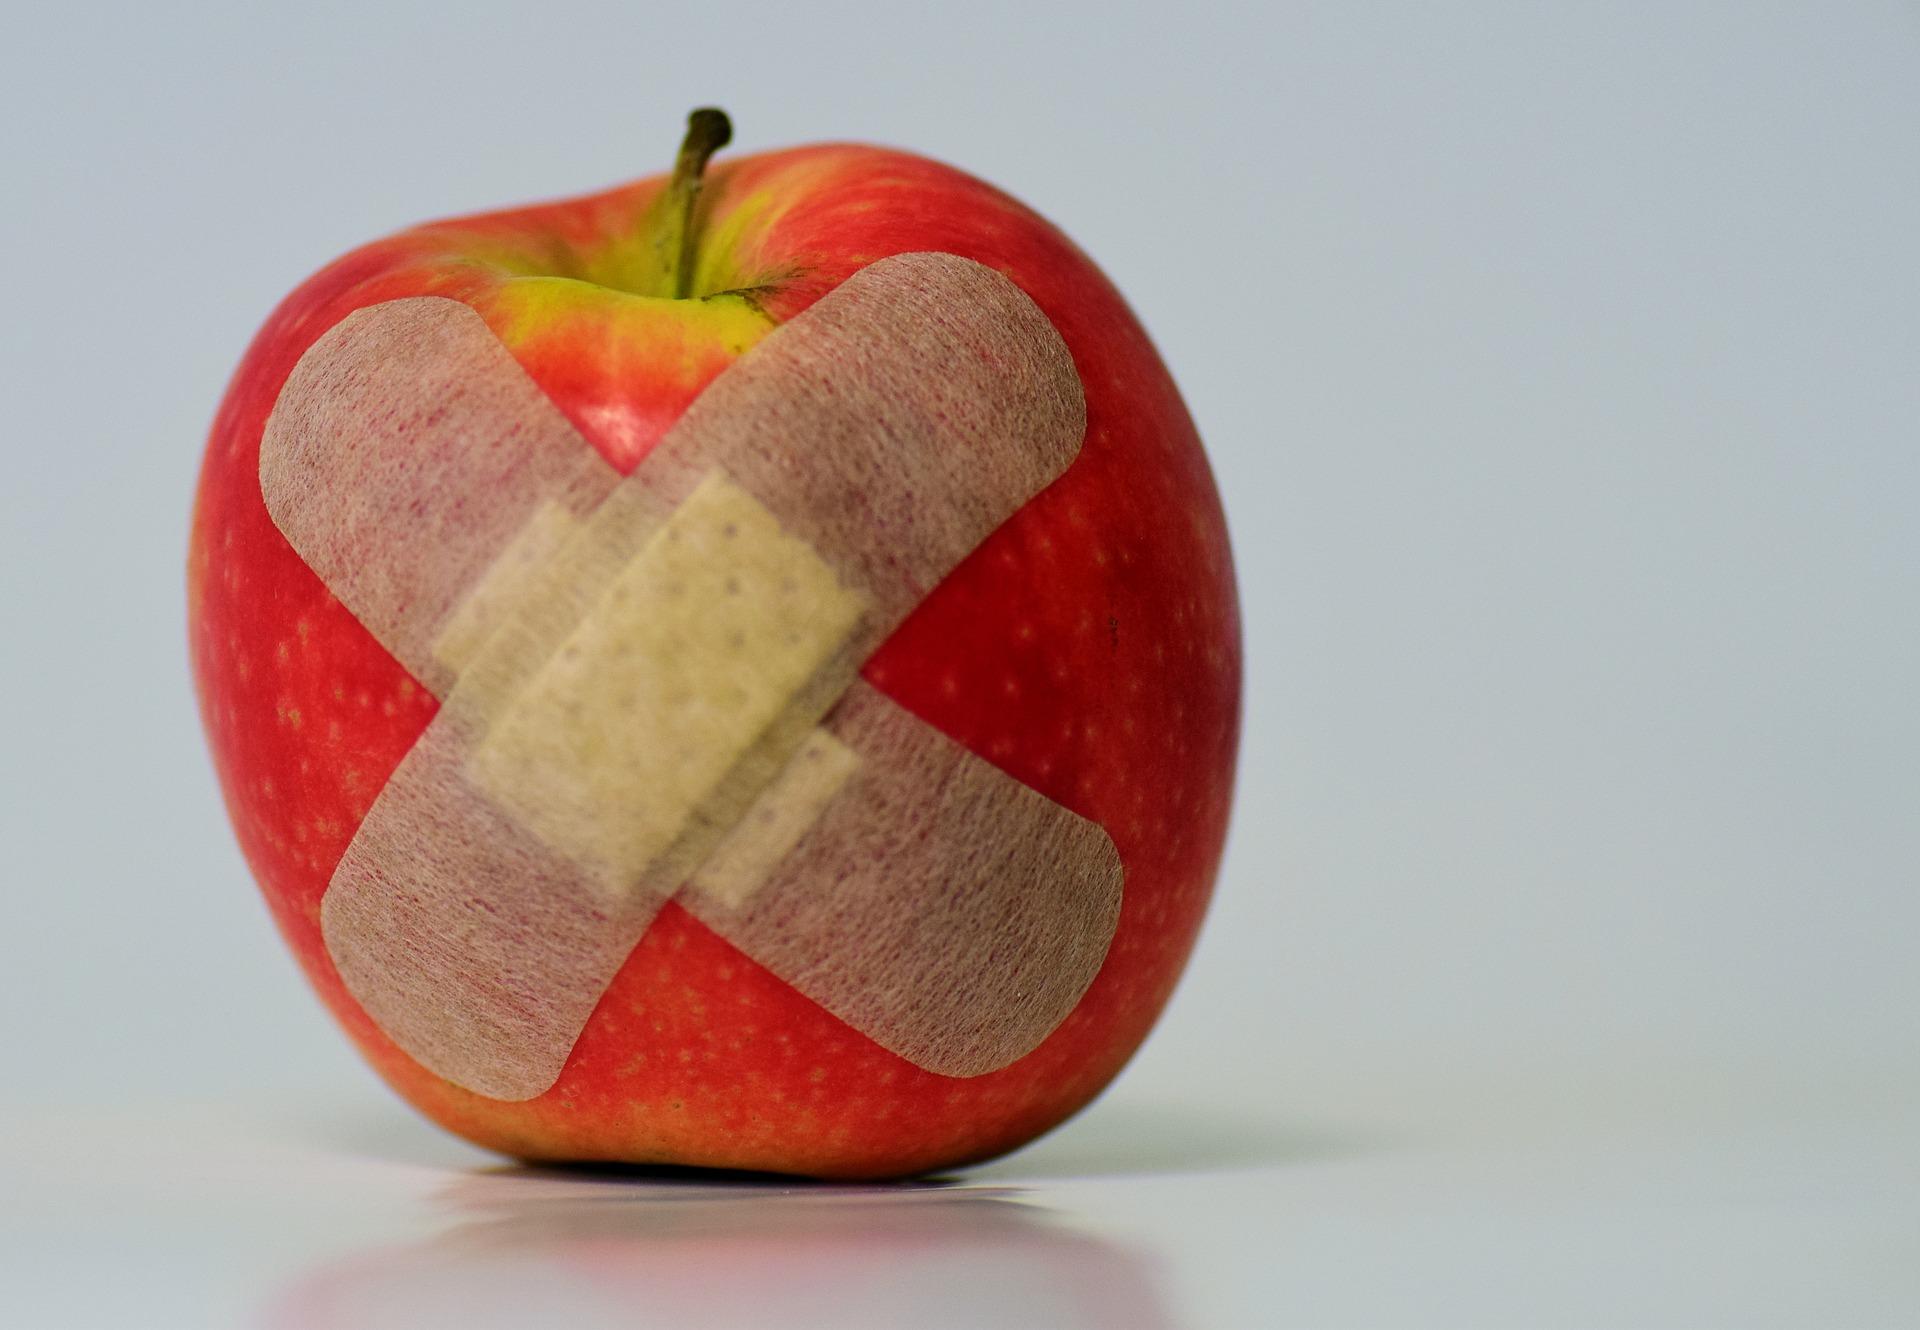 apple-2172165_1920